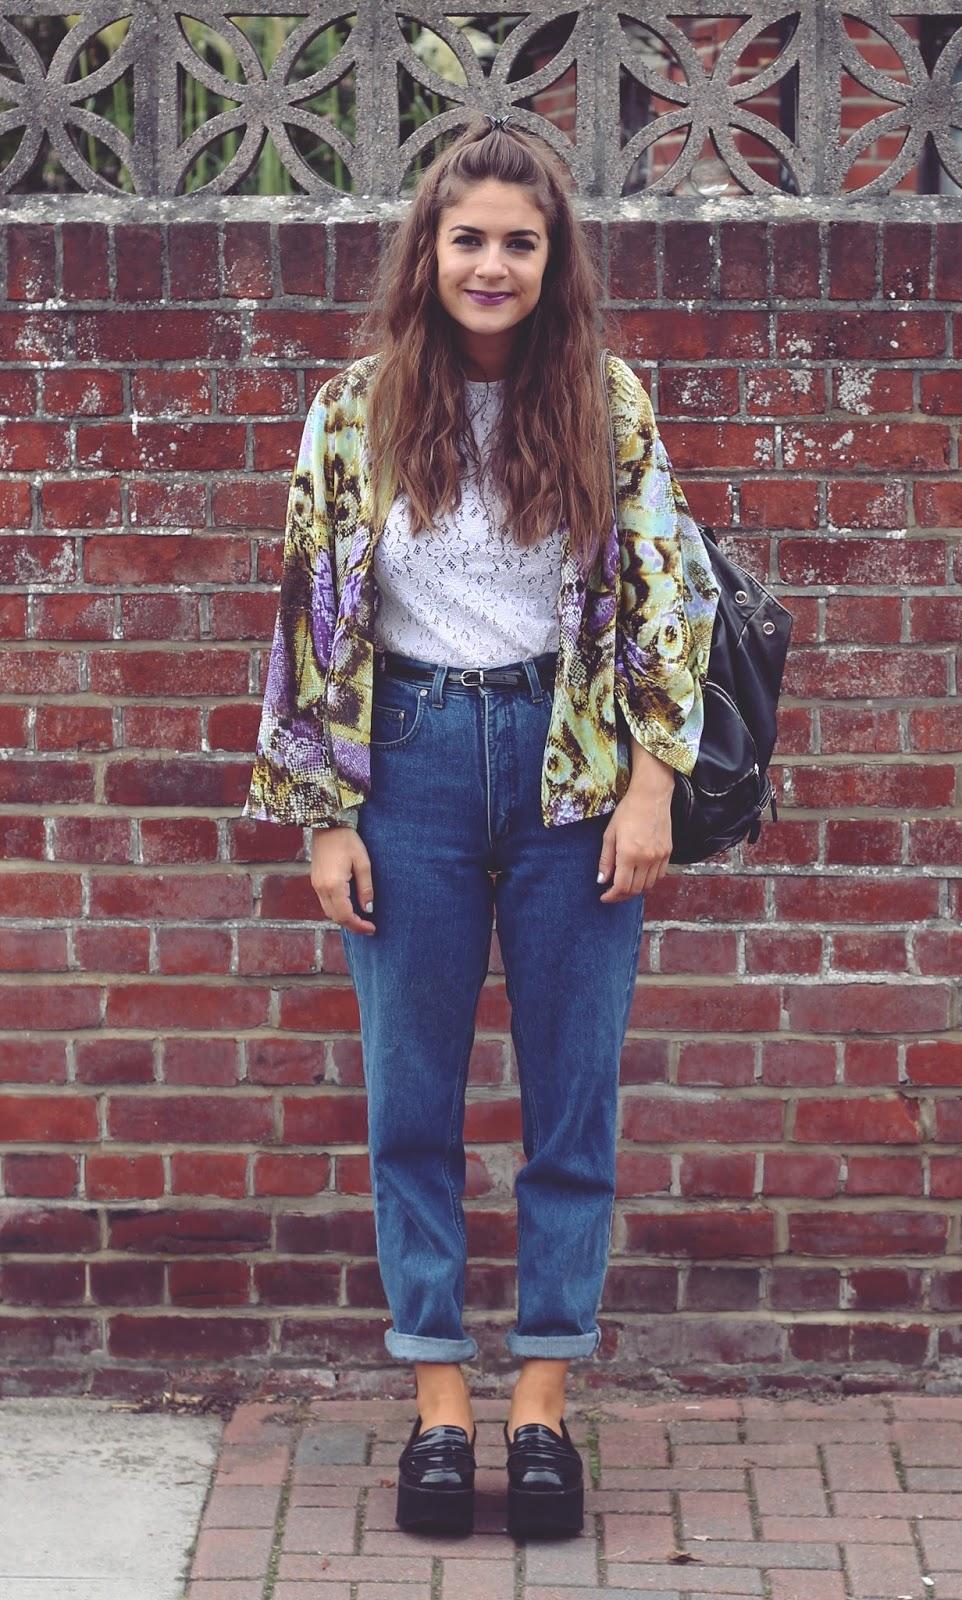 College Student Fashion Bloggers